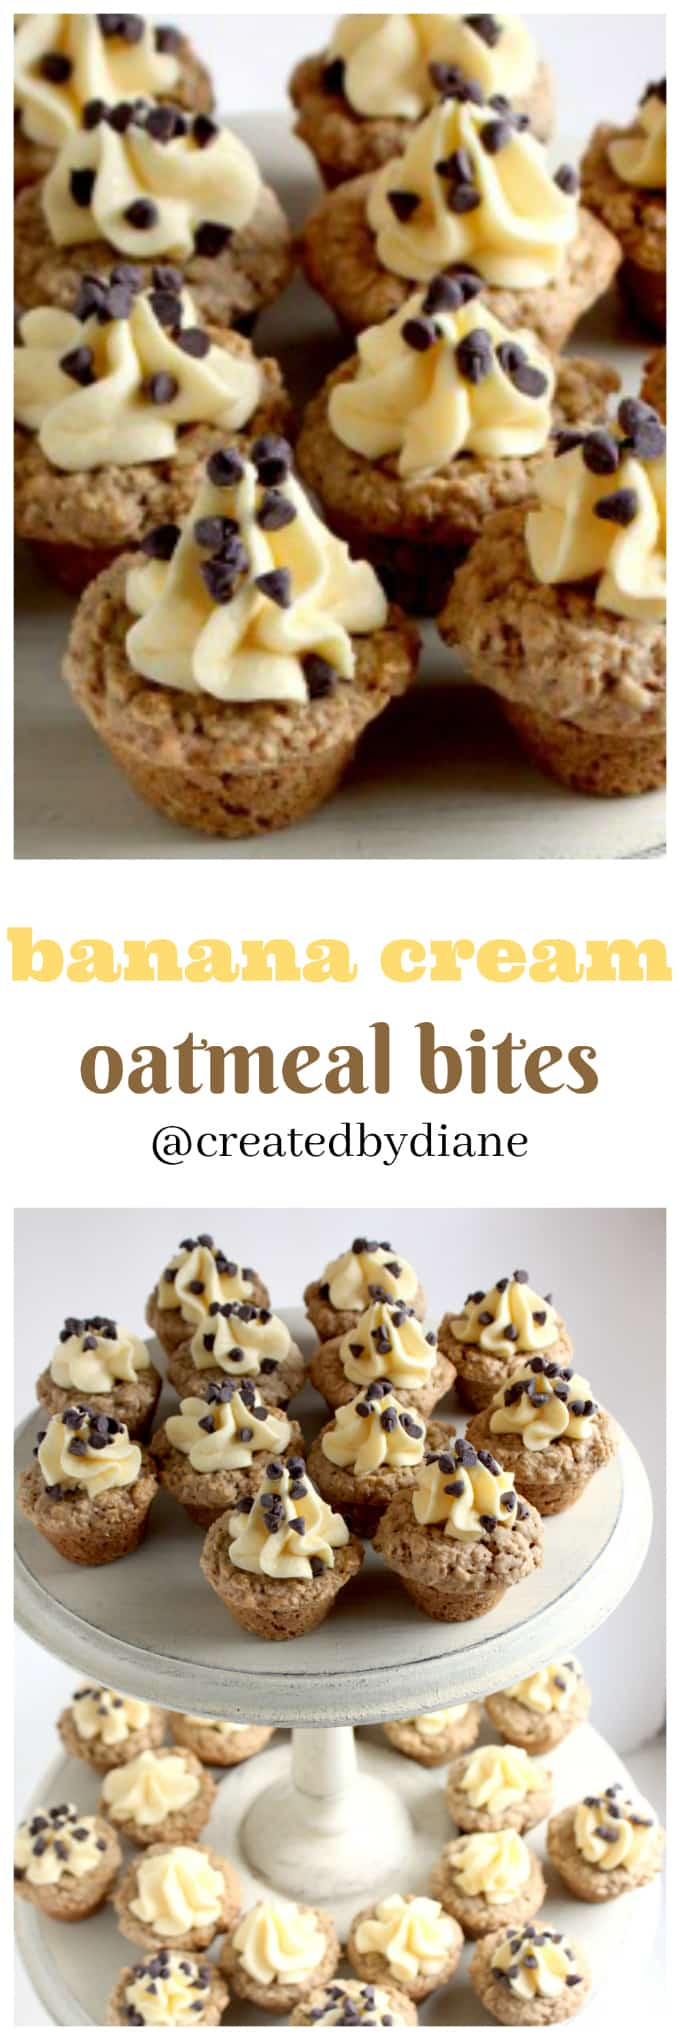 banana cream oatmeal bites @createdbydiane